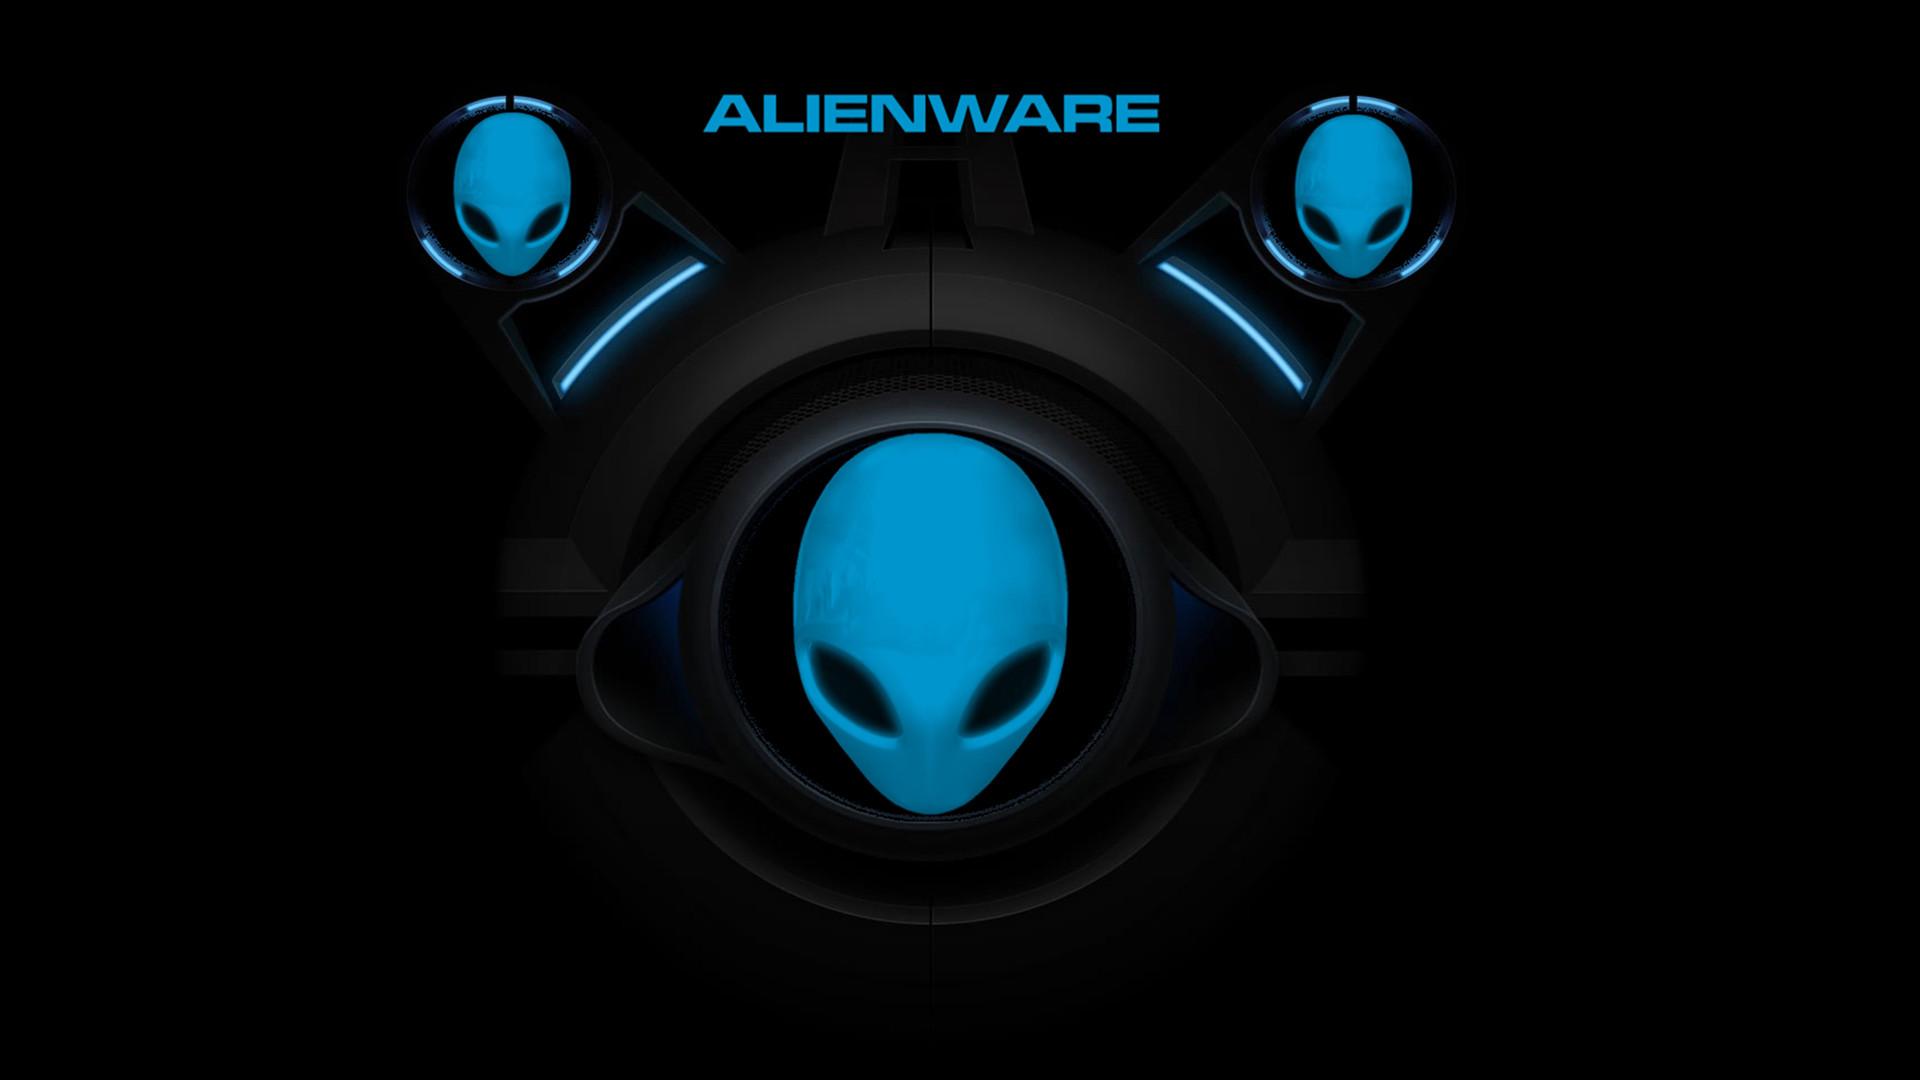 The 25 best ideas about Alienware Wallpaper on Pinterest .